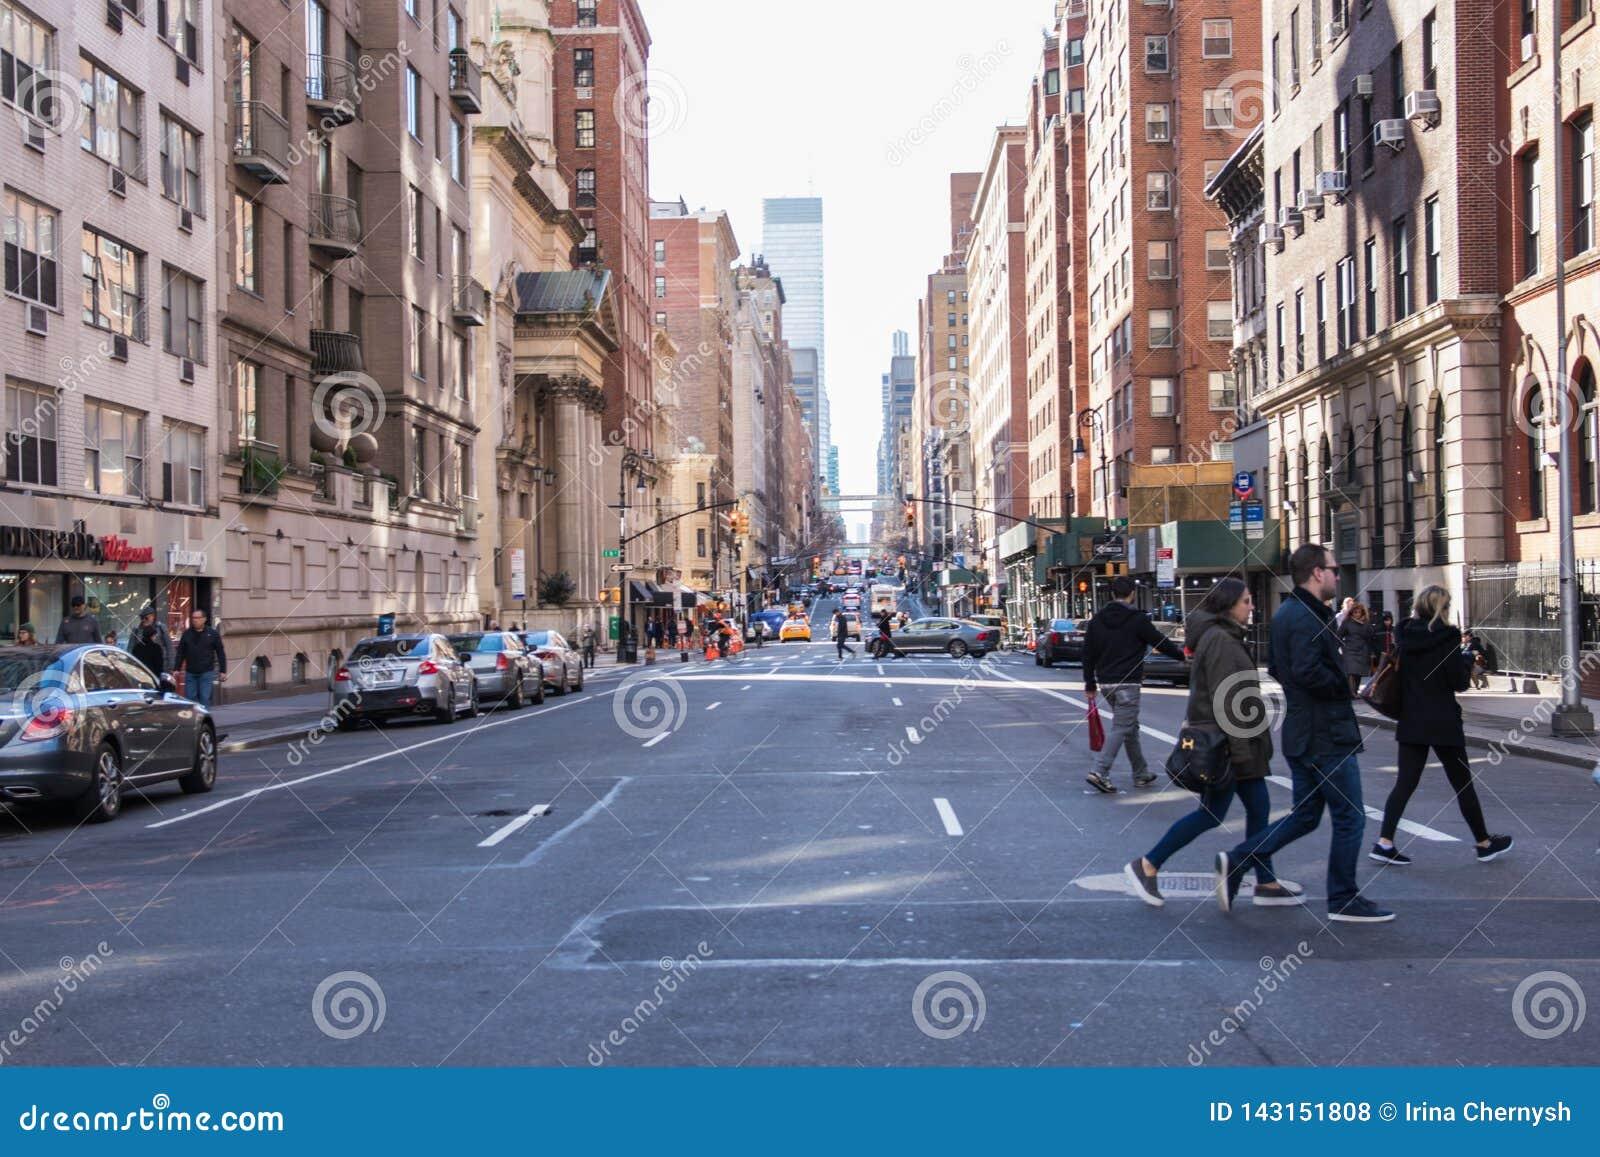 Vista tipica della via in Manhattan NEW YORK U.S.A. - 3 gennaio 2019